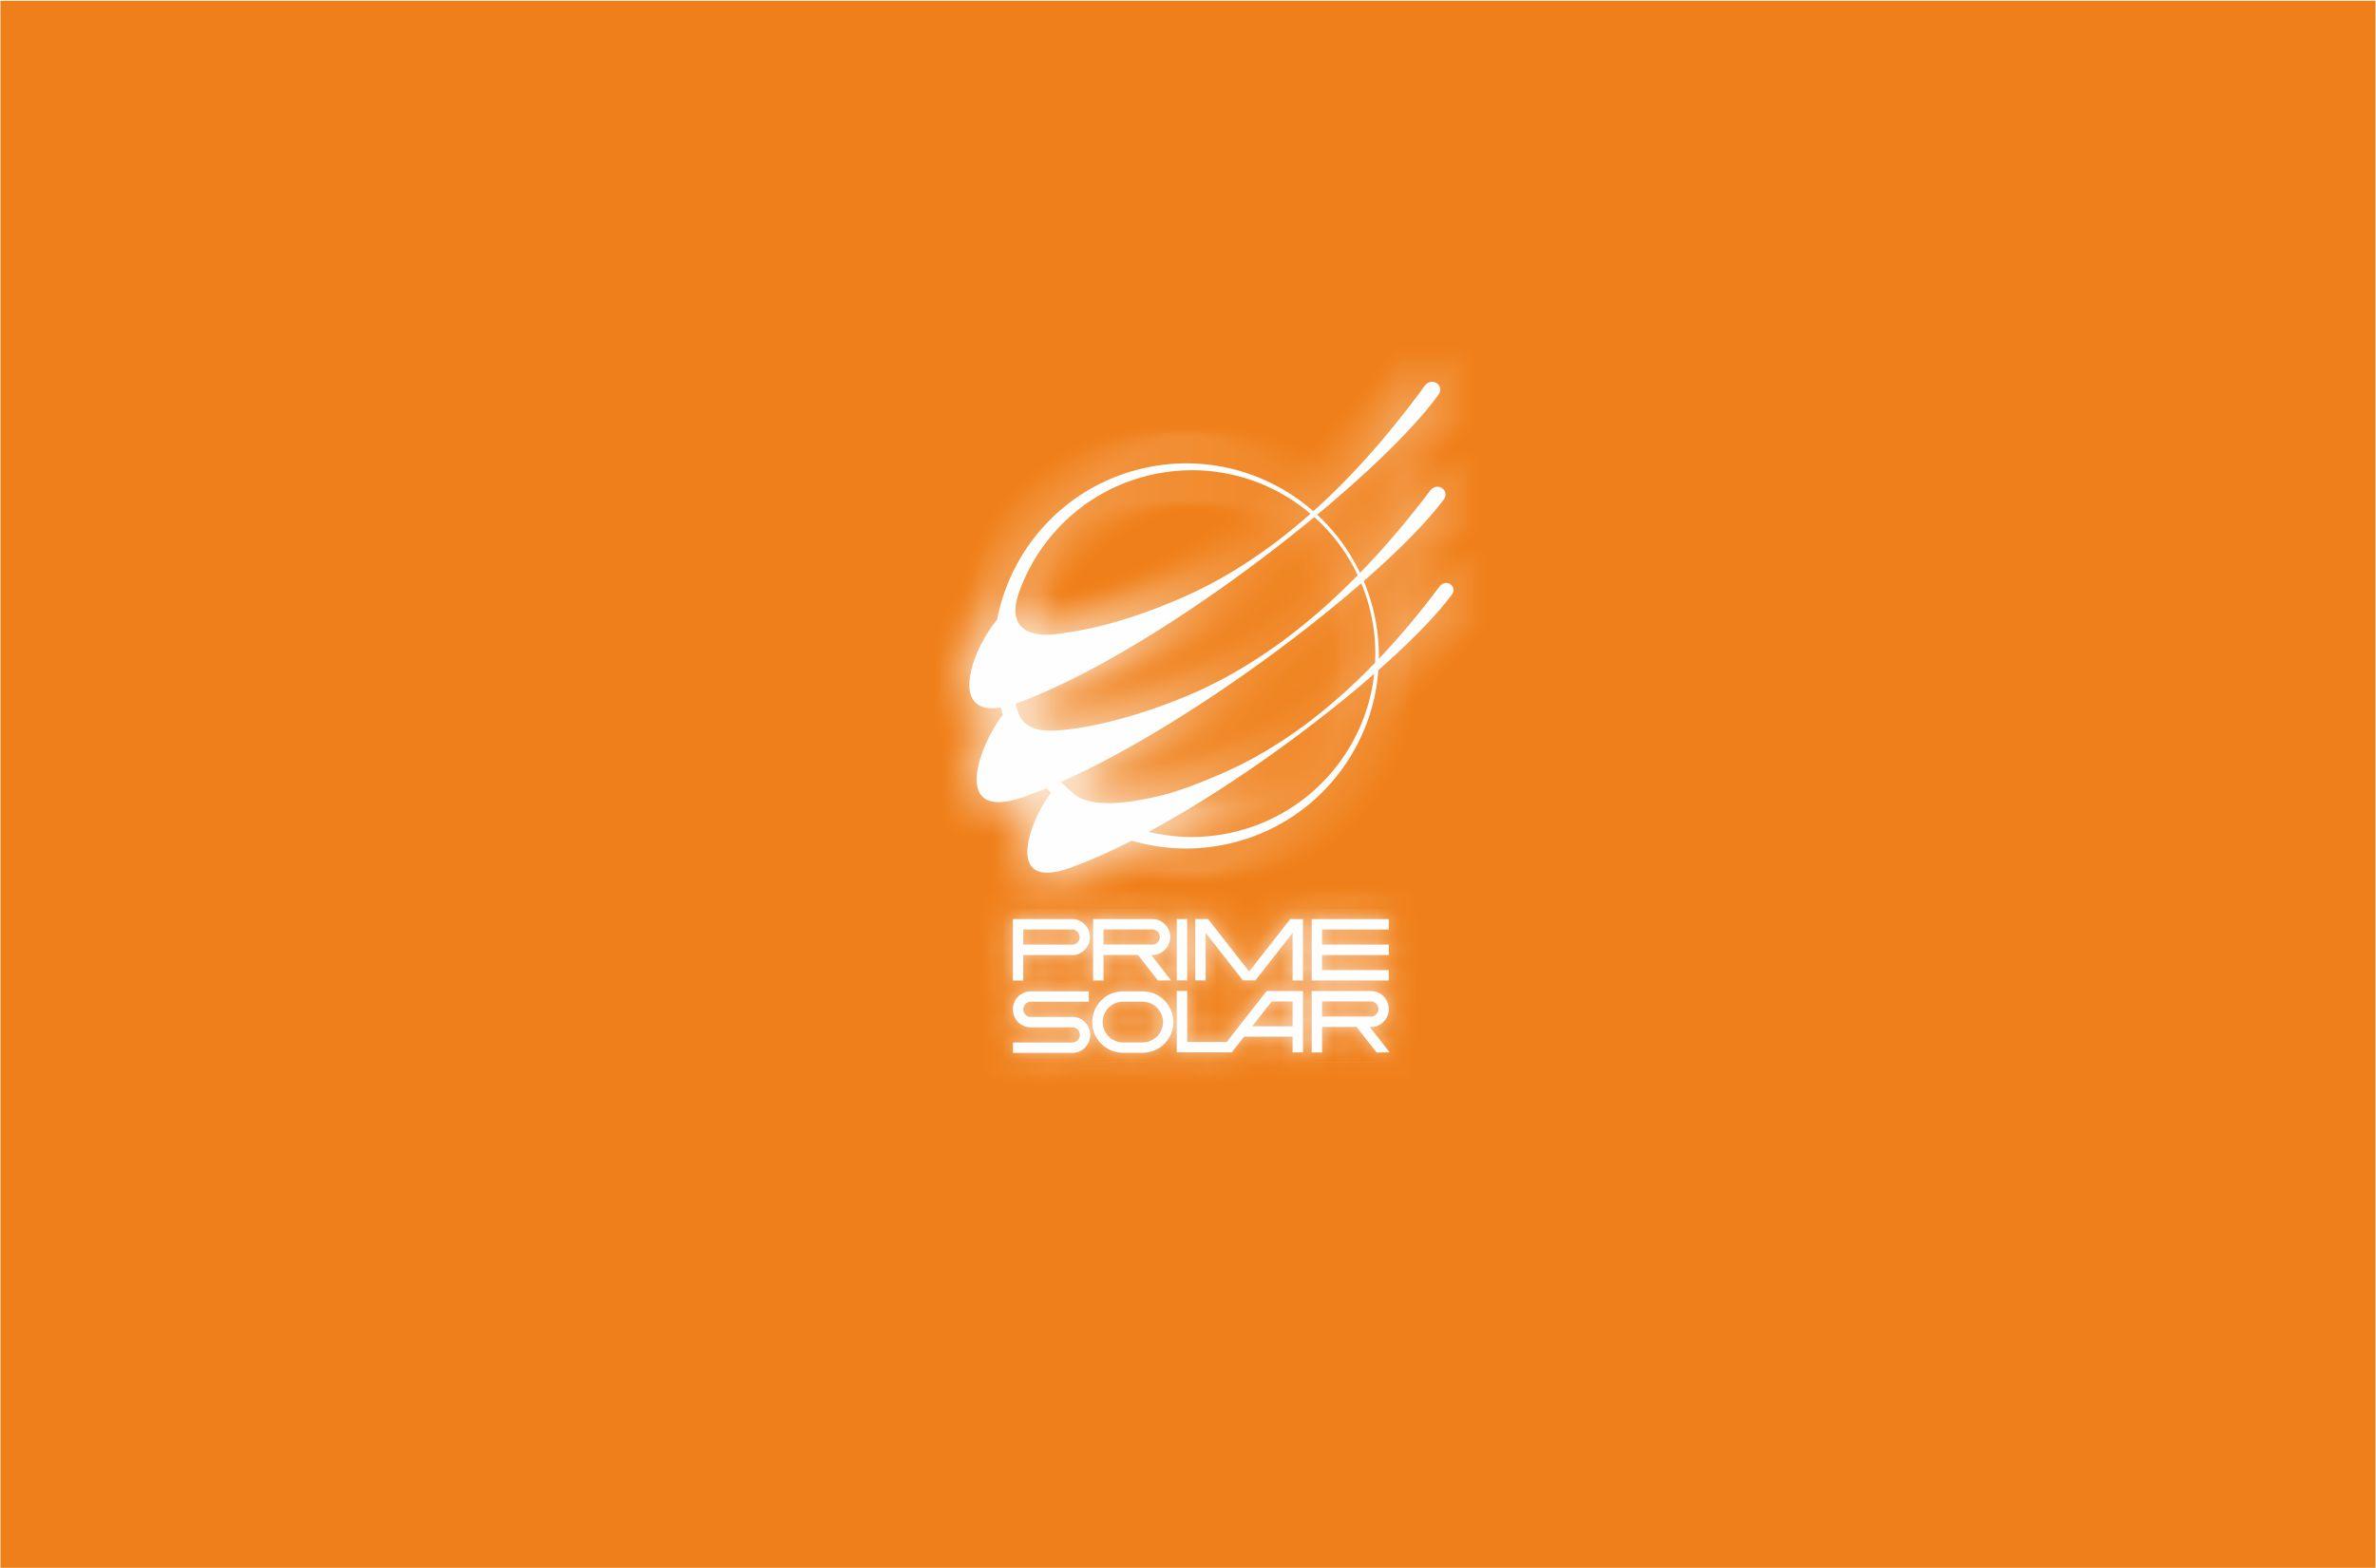 Логотип компании PrimeSolar [UPD: 16:45 15/12/11] фото f_4f03bddd4a5b0.jpg